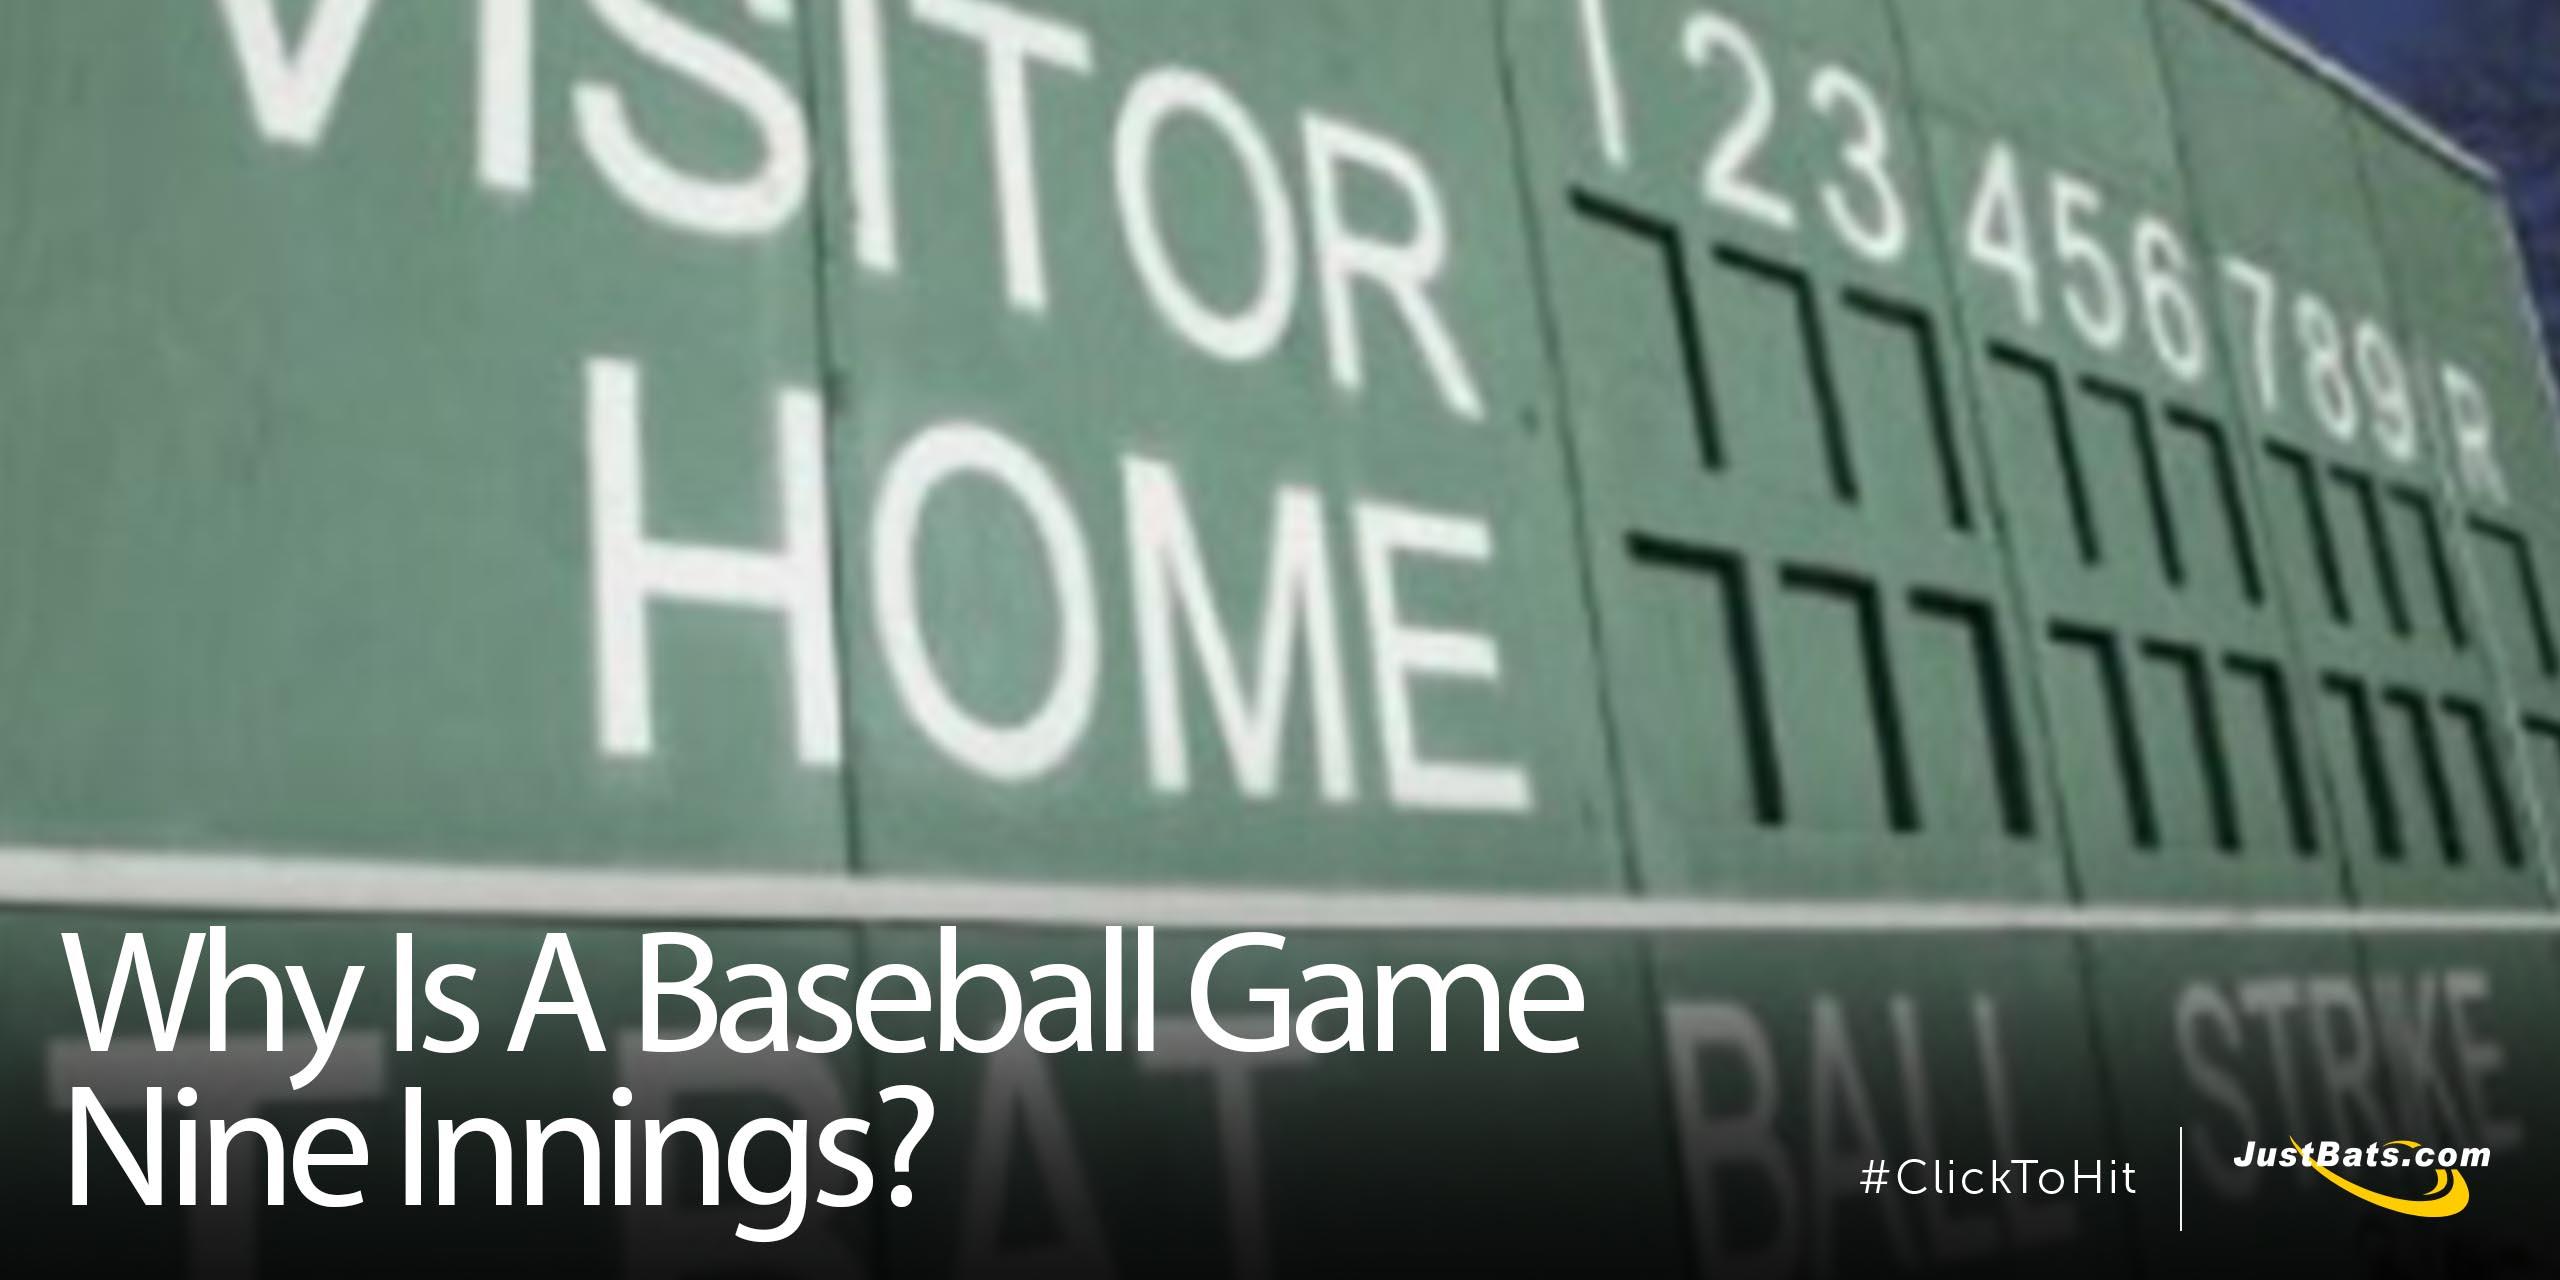 Why Is A Baseball Game 9 Innings - Blog.jpg